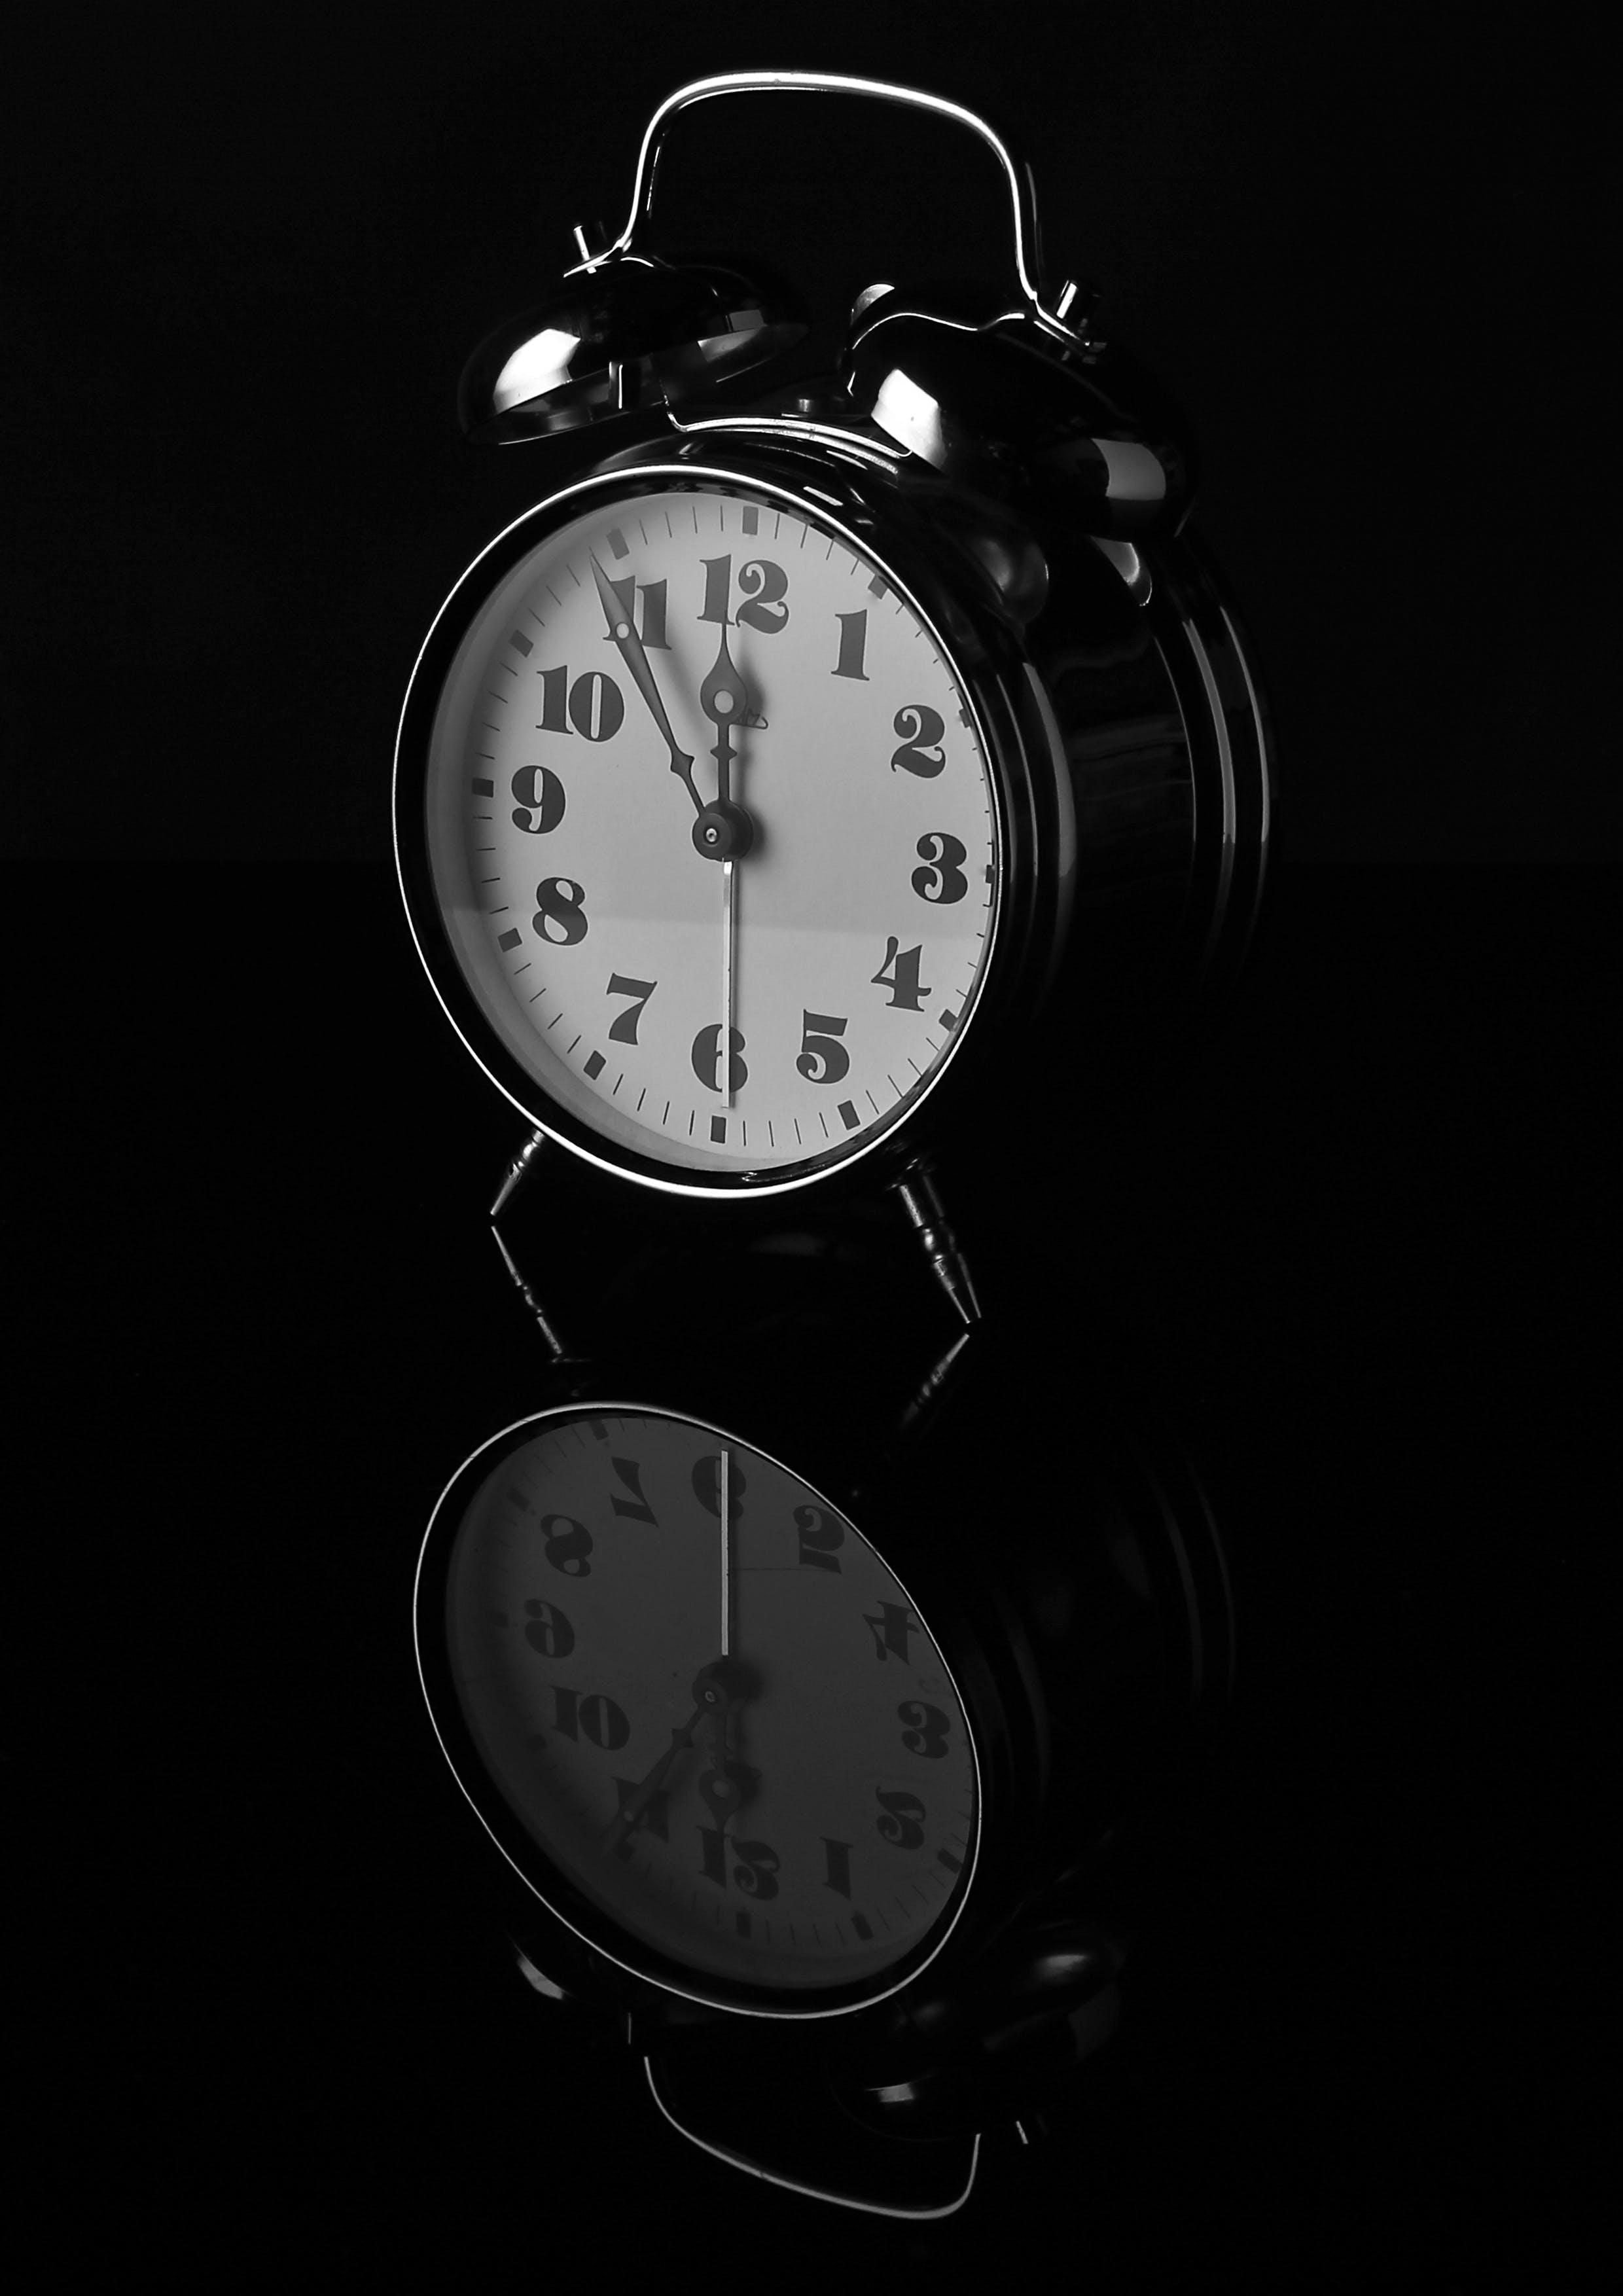 Black Alarm Clock Displaying 12:55